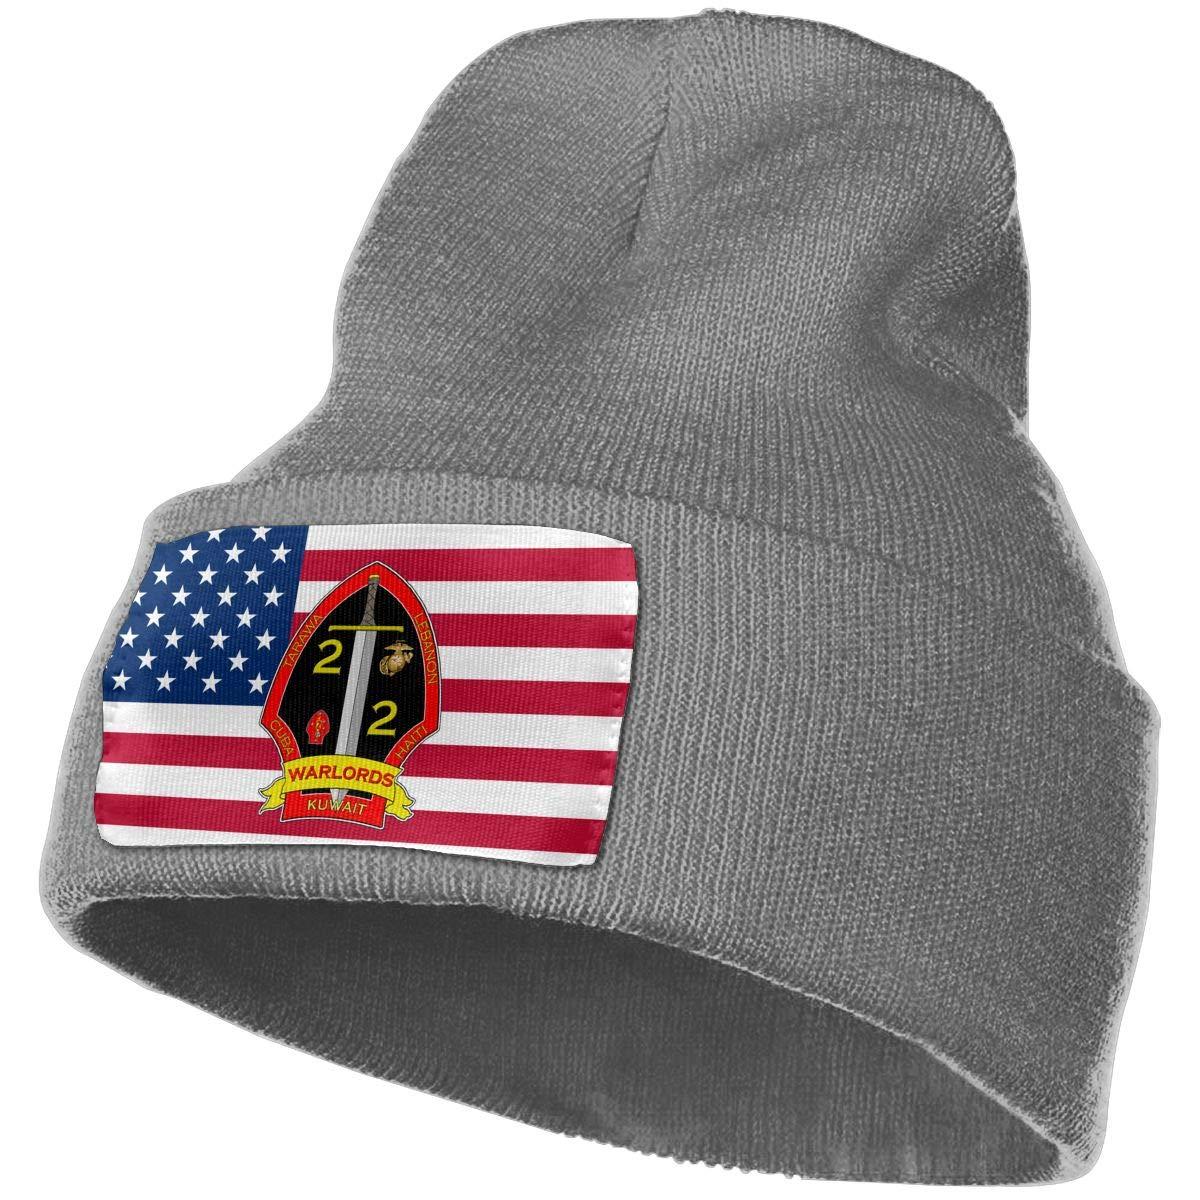 2nd Battalion 2nd Marines Men/&Women Warm Winter Knit Plain Beanie Hat Skull Cap Acrylic Knit Cuff Hat